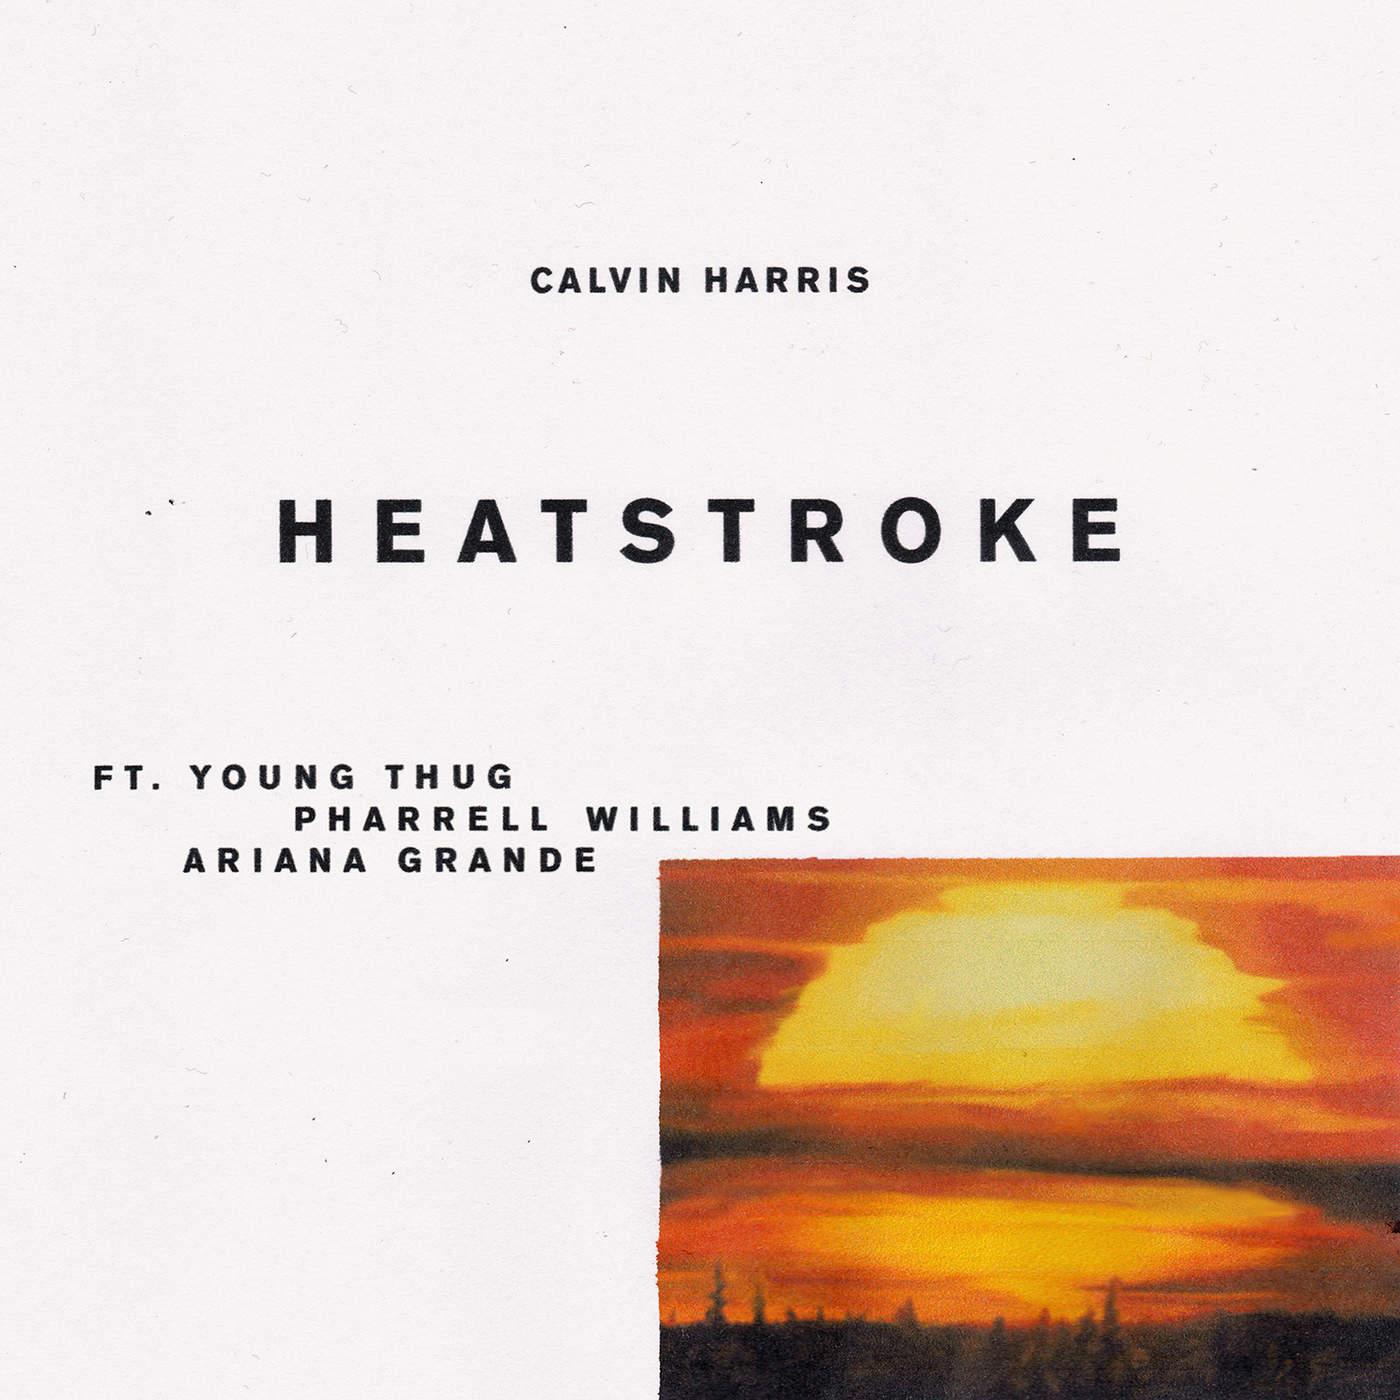 Calvin Harris - Heatstroke (feat. Young Thug, Pharrell Williams & Ariana Grande) - Single Cover